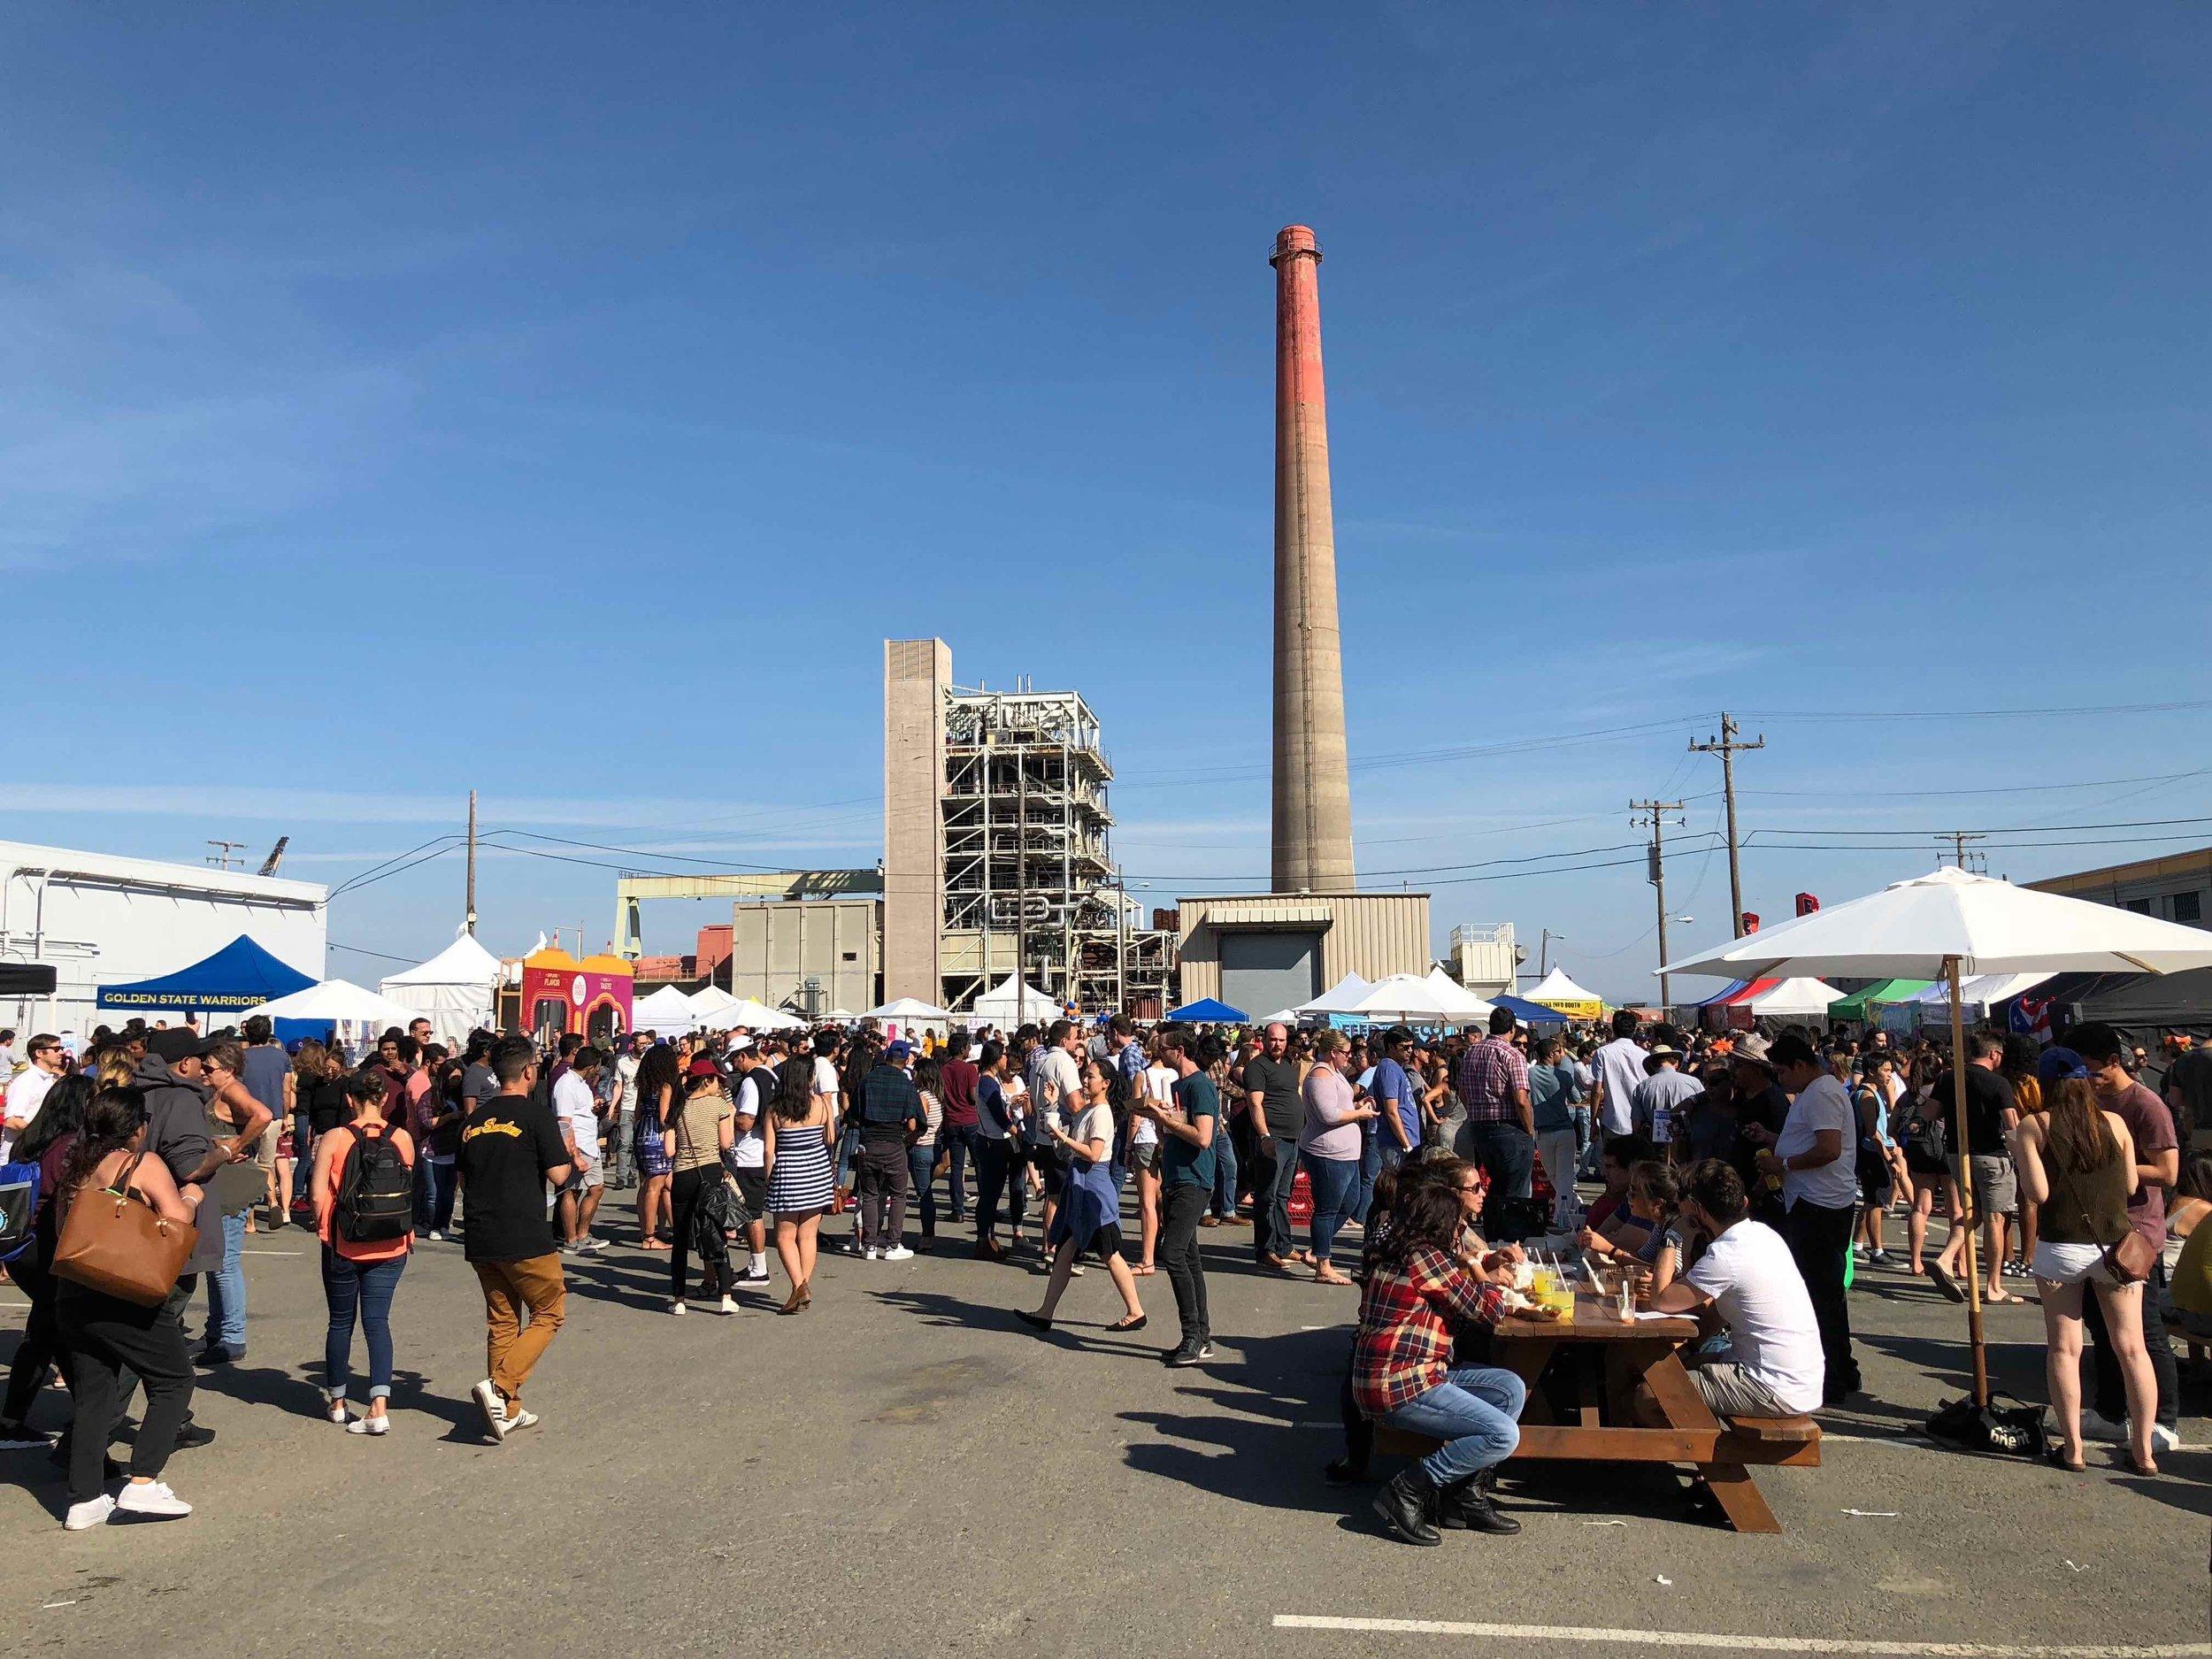 La Cocina Street Food Festival